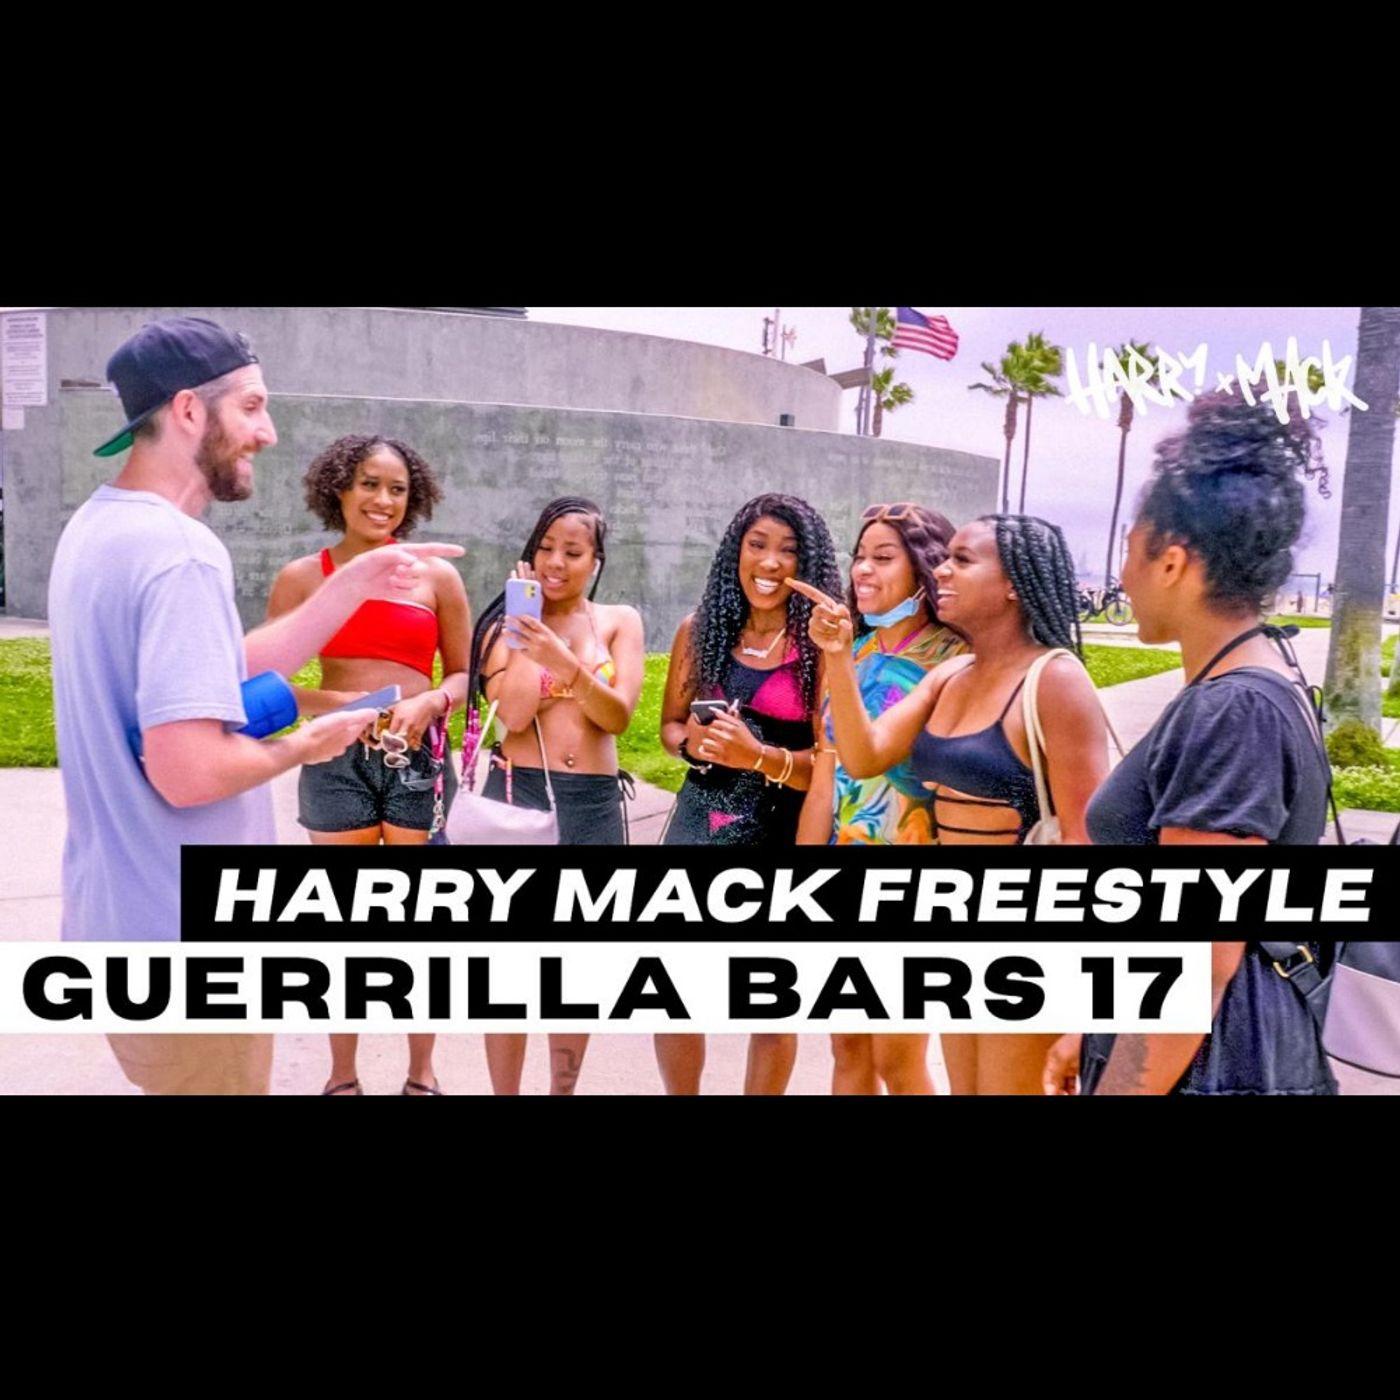 Harry Mack Freestyles Return To Venice Beach   Guerrilla Bars 17